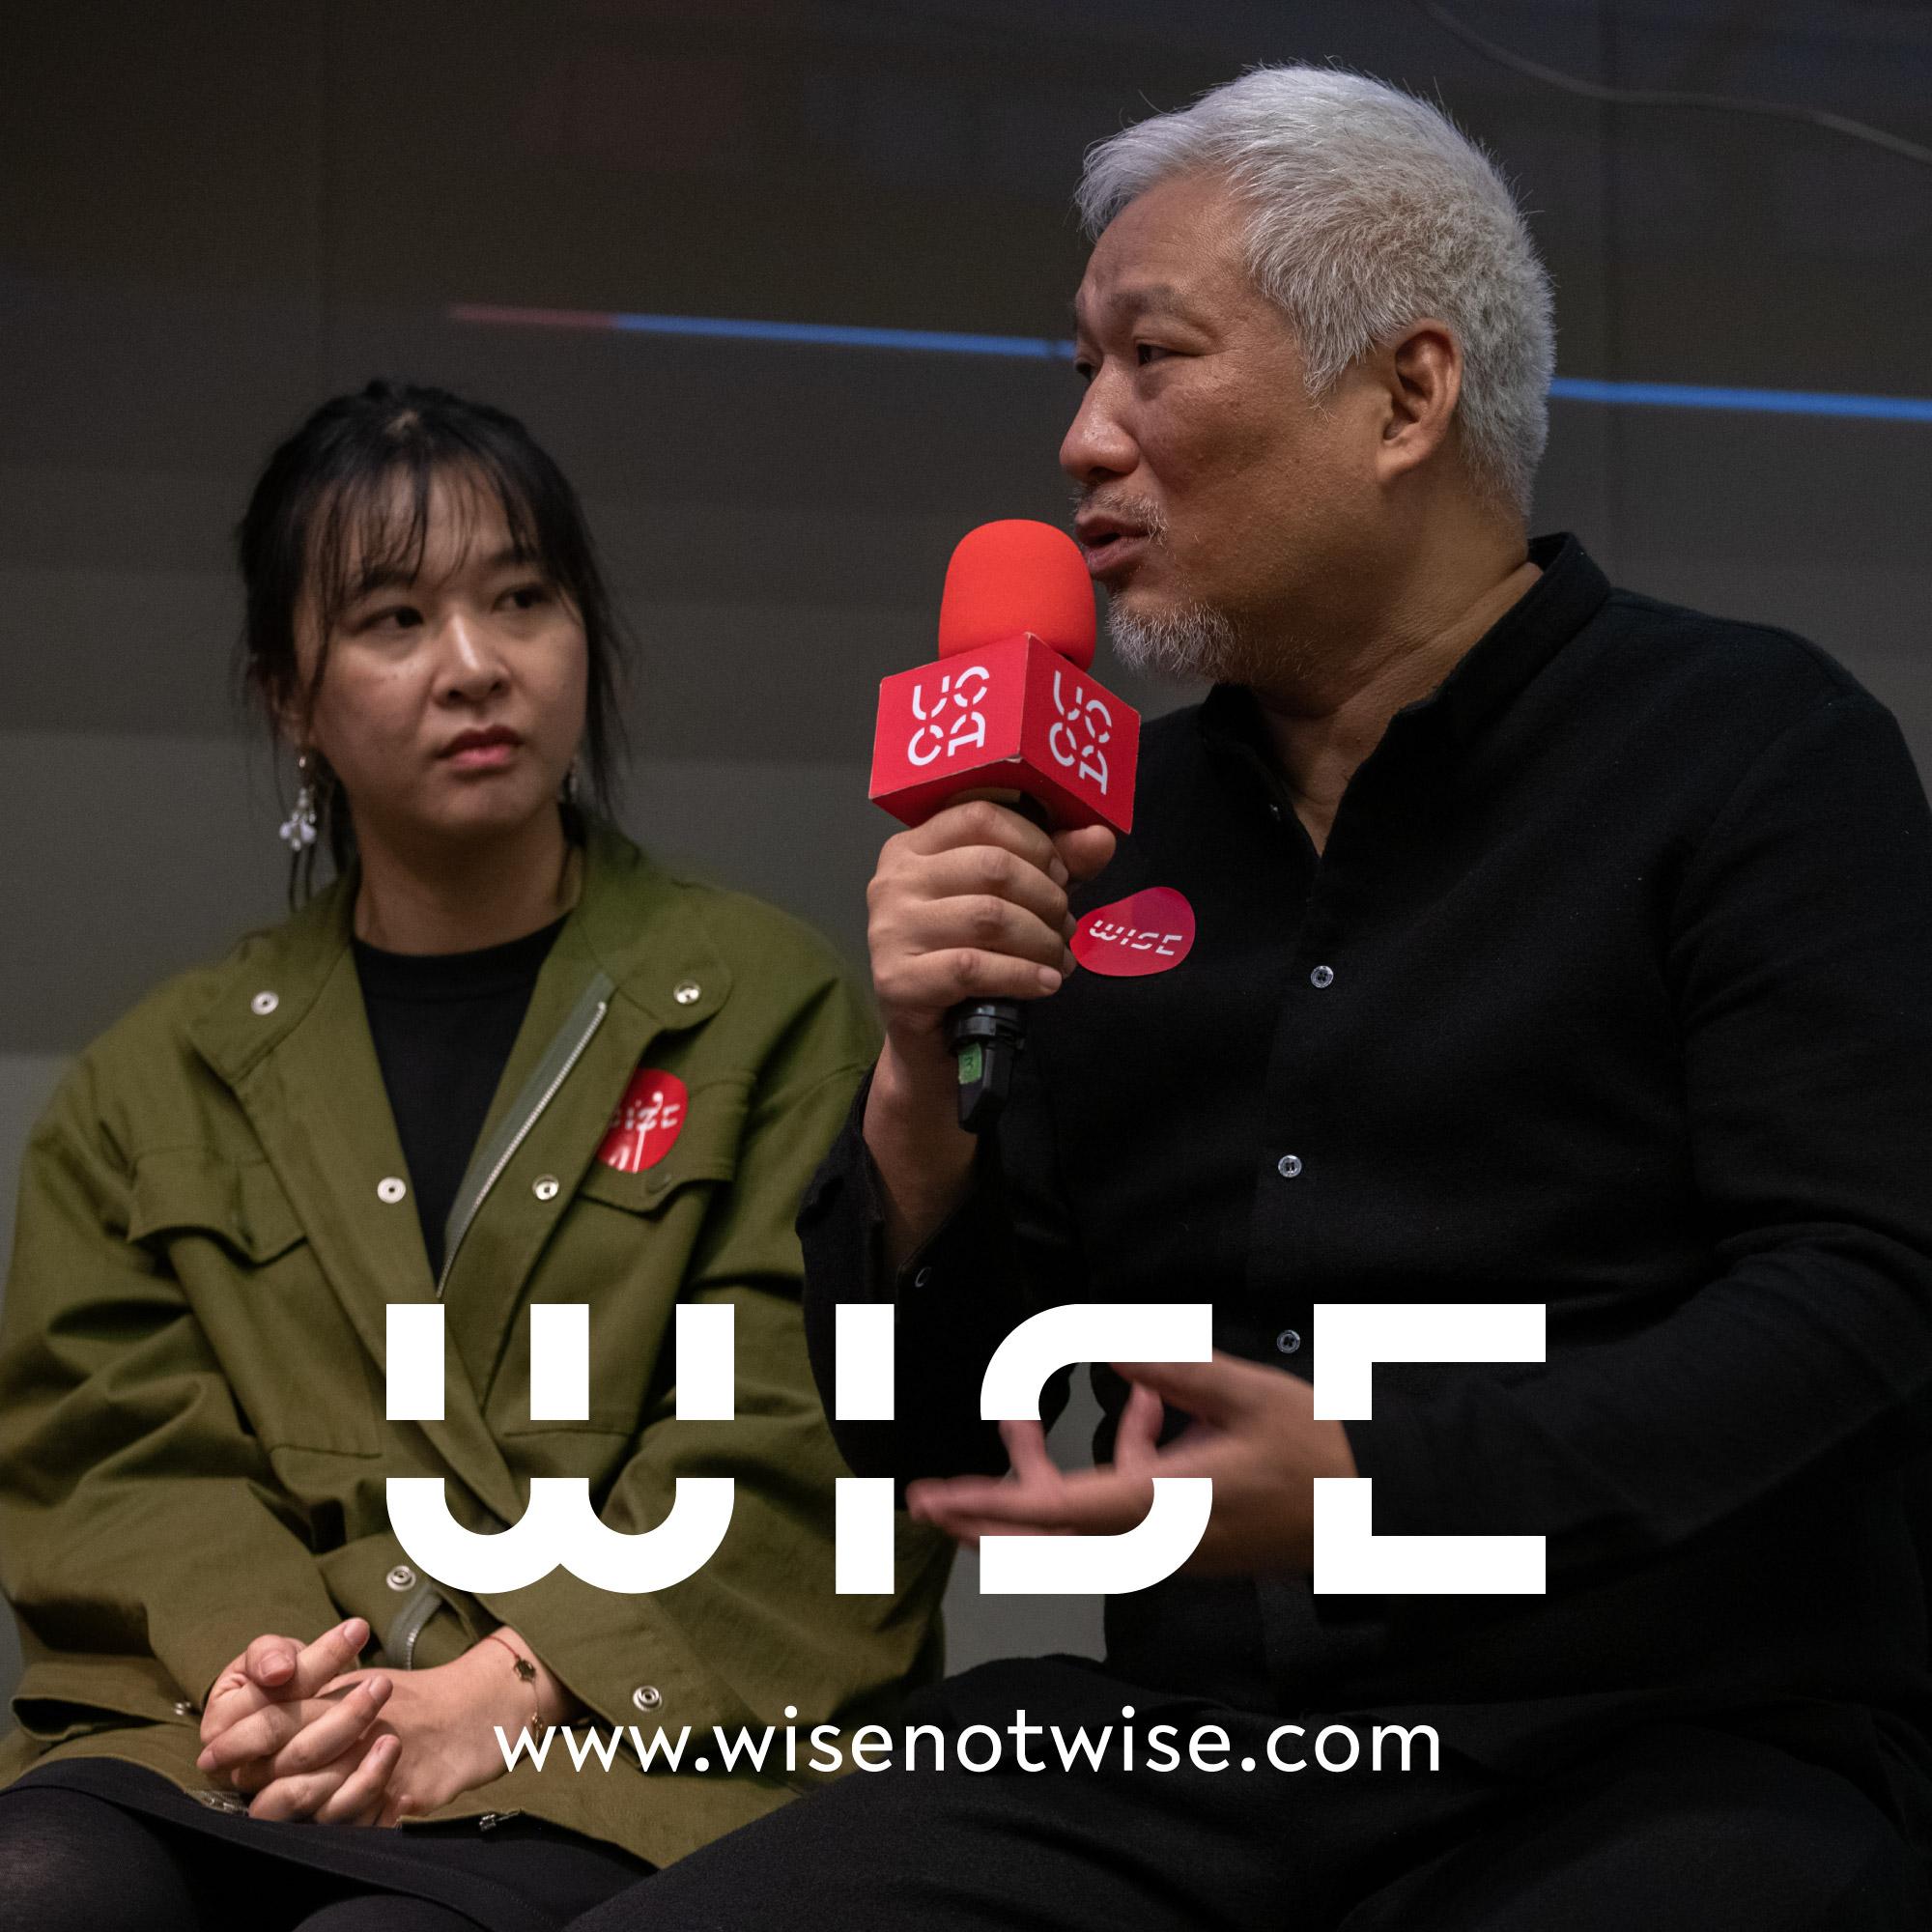 WISE_RECAP_2019_DAY_1_29.jpg